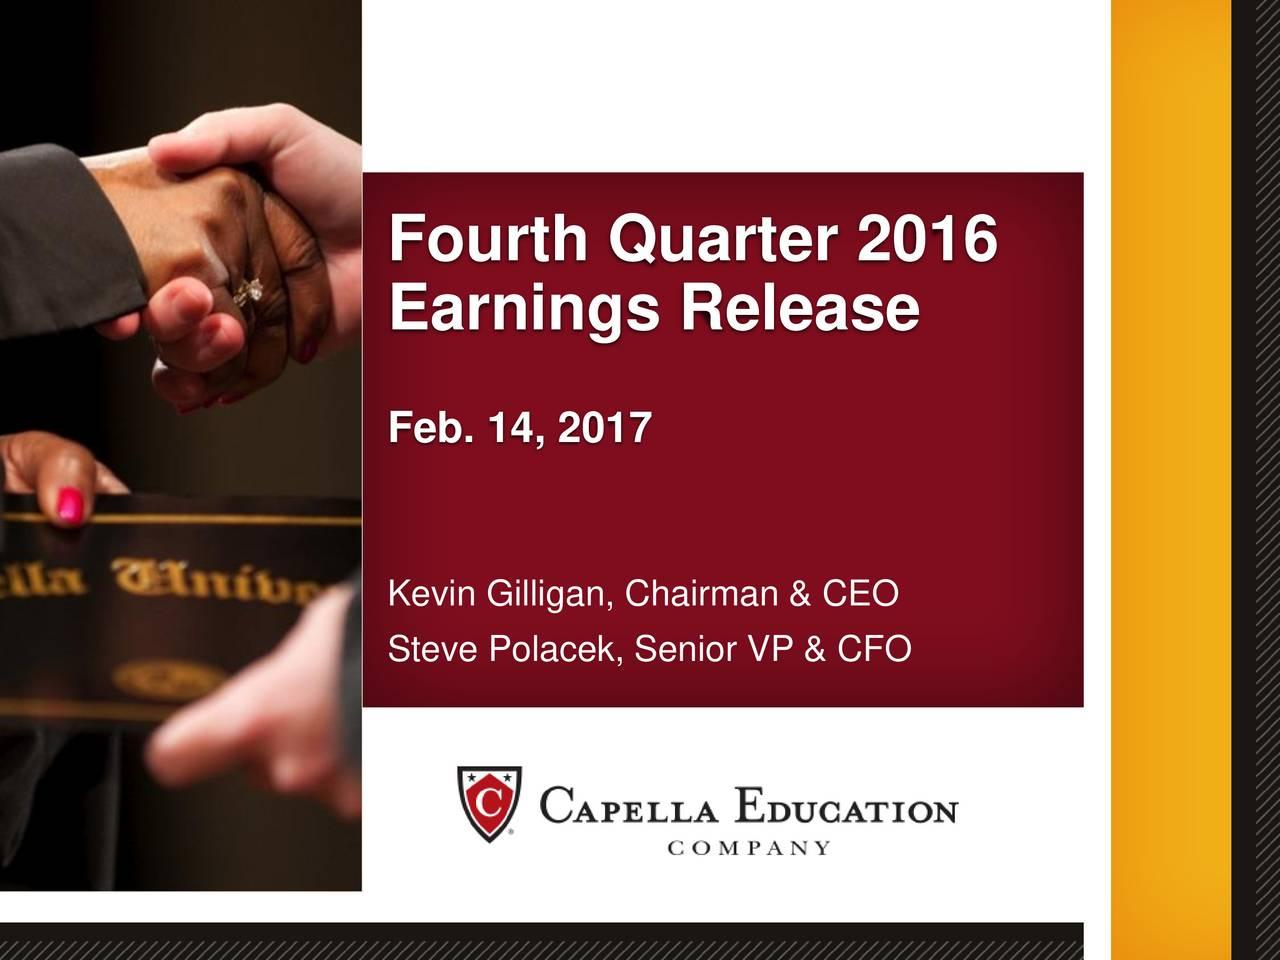 Earnings Release Feb. 14, 2017 Kevin Gilligan, Chairman & CEO Steve Polacek, Senior VP & CFO